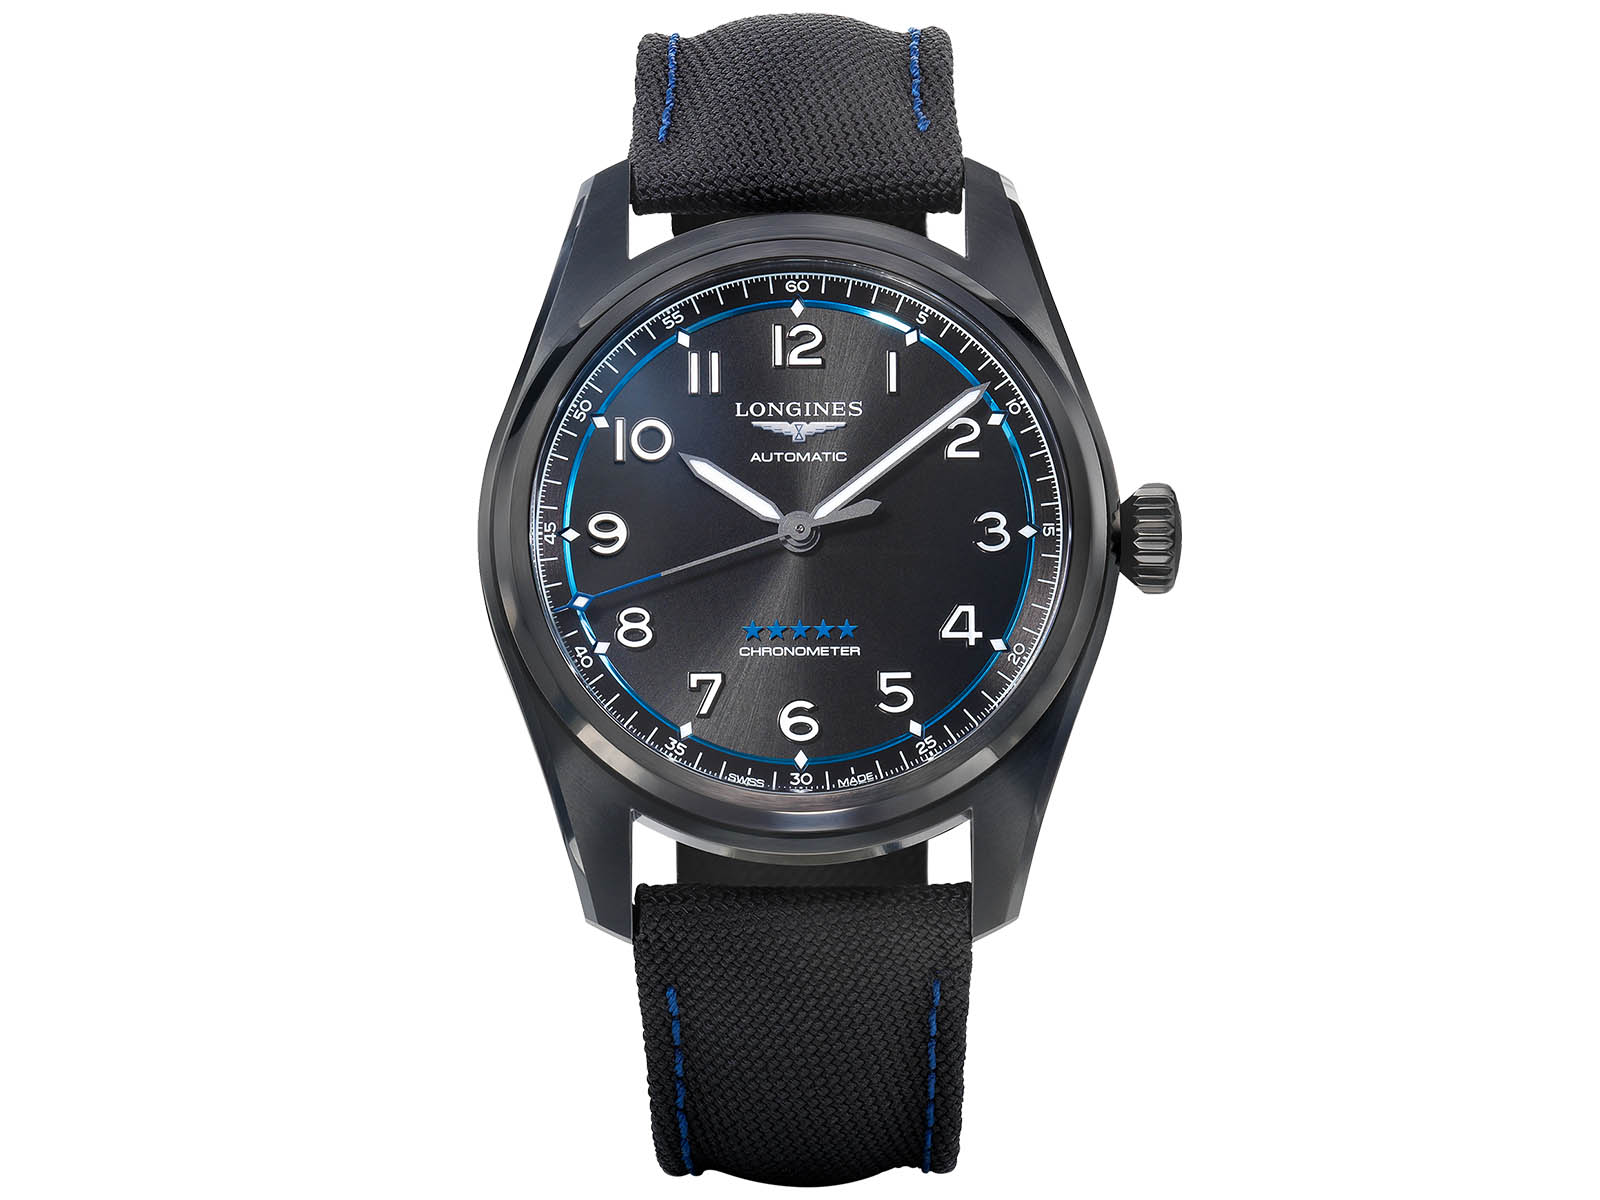 l3-810-2-99-2-longines-spirit-bucherer-blue-automatic-4.jpg